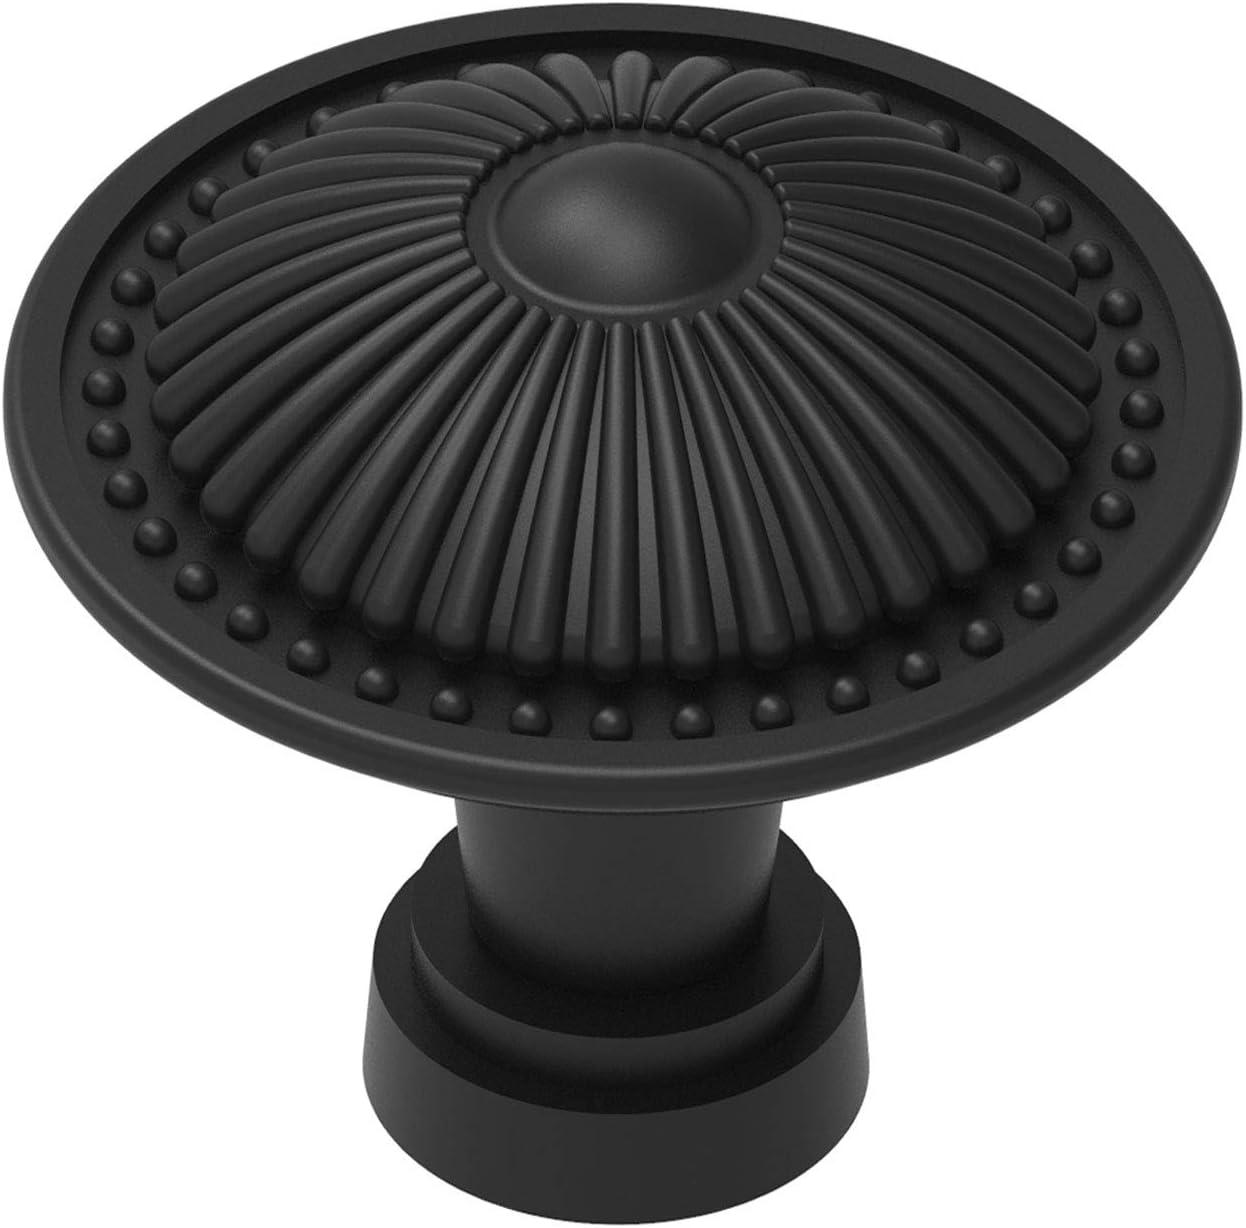 15-Pack Flat Black Pull Knobs for Kitchen Bedroom Cabinet, Round Black Dresser Handle Vintage Drawer Hardware for Wood Closet Furniture Door Decoration with Victorian Flower